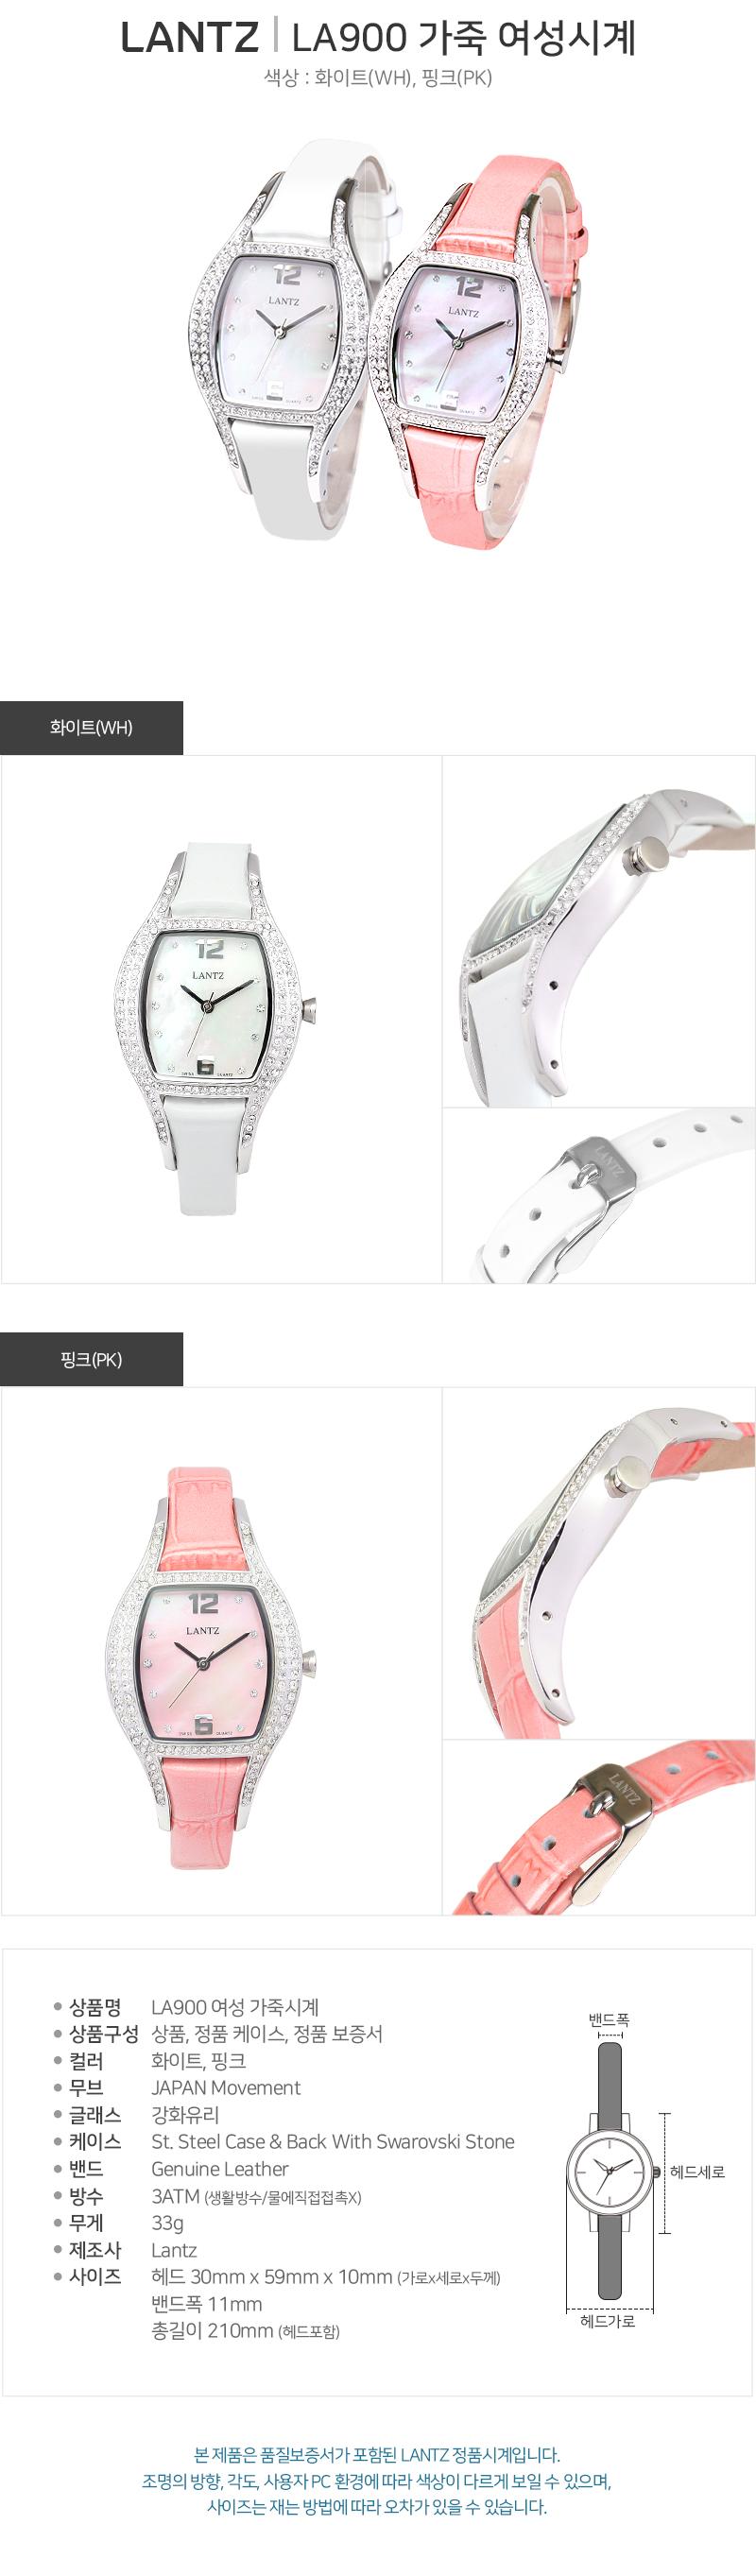 LA900 가죽 여성시계 - 란쯔, 78,000원, 여성시계, 가죽시계